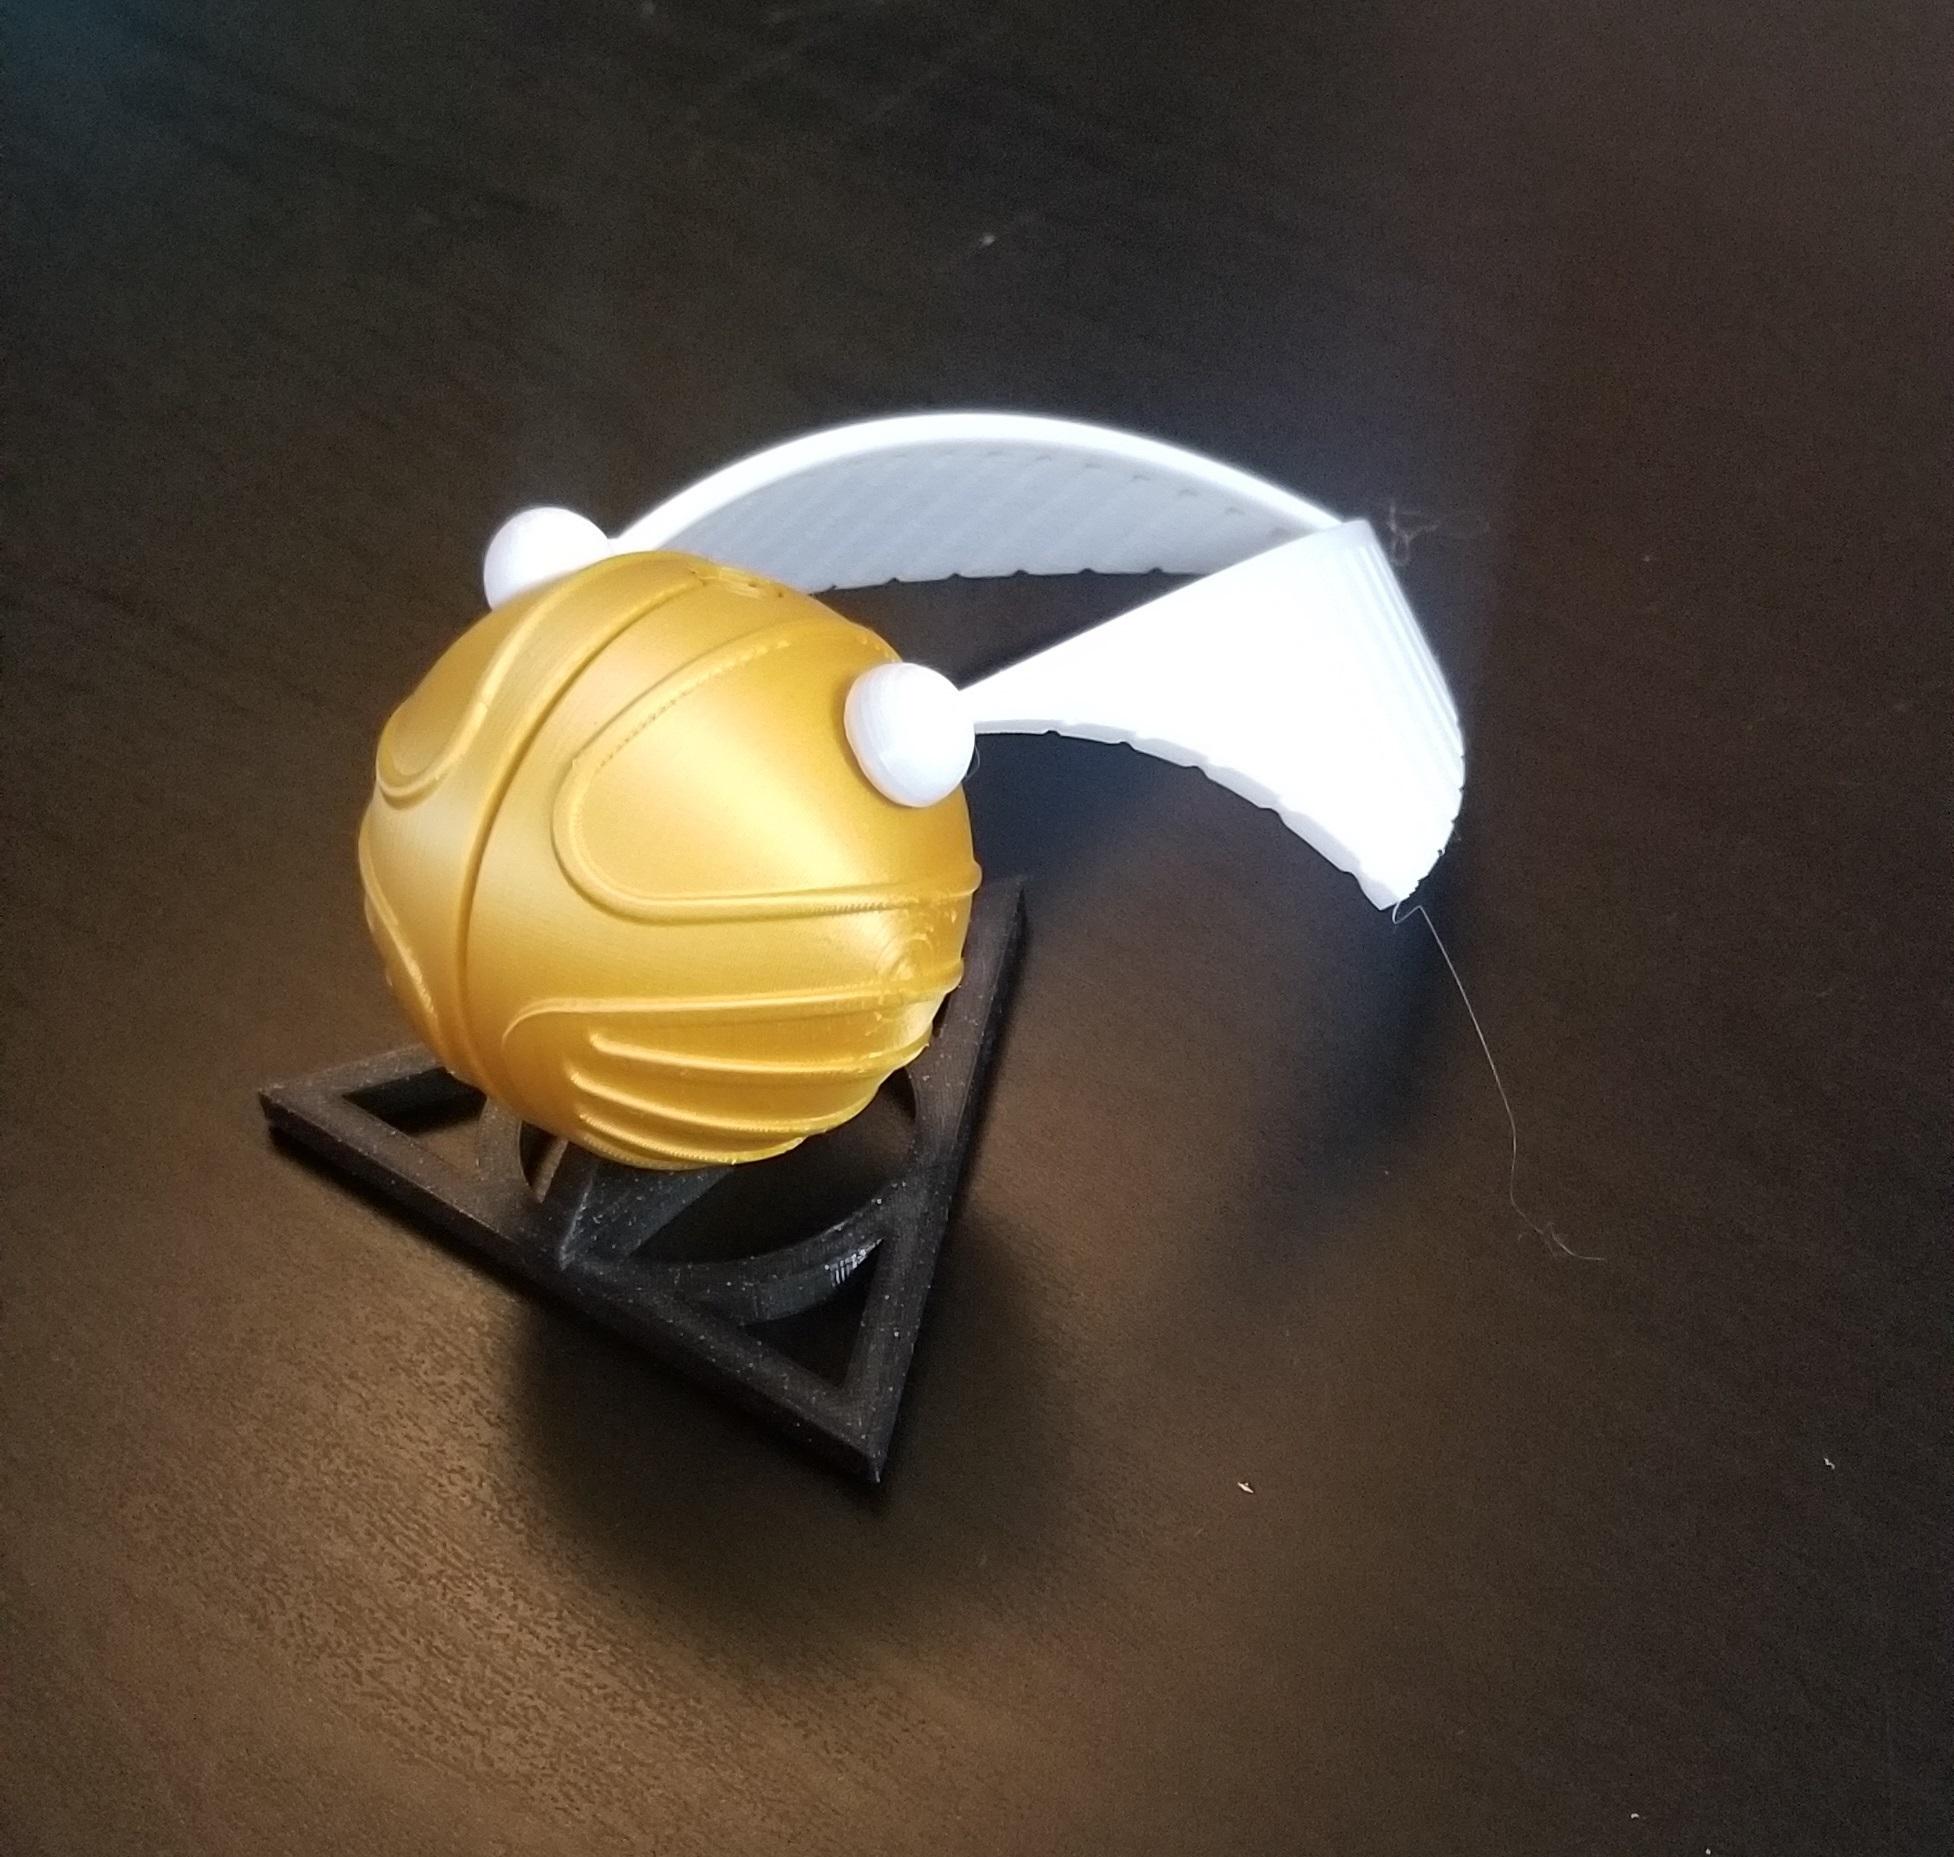 20201017_152741.jpg Download STL file Golden snitch Puzzle • Model to 3D print, 3DPrintersaur